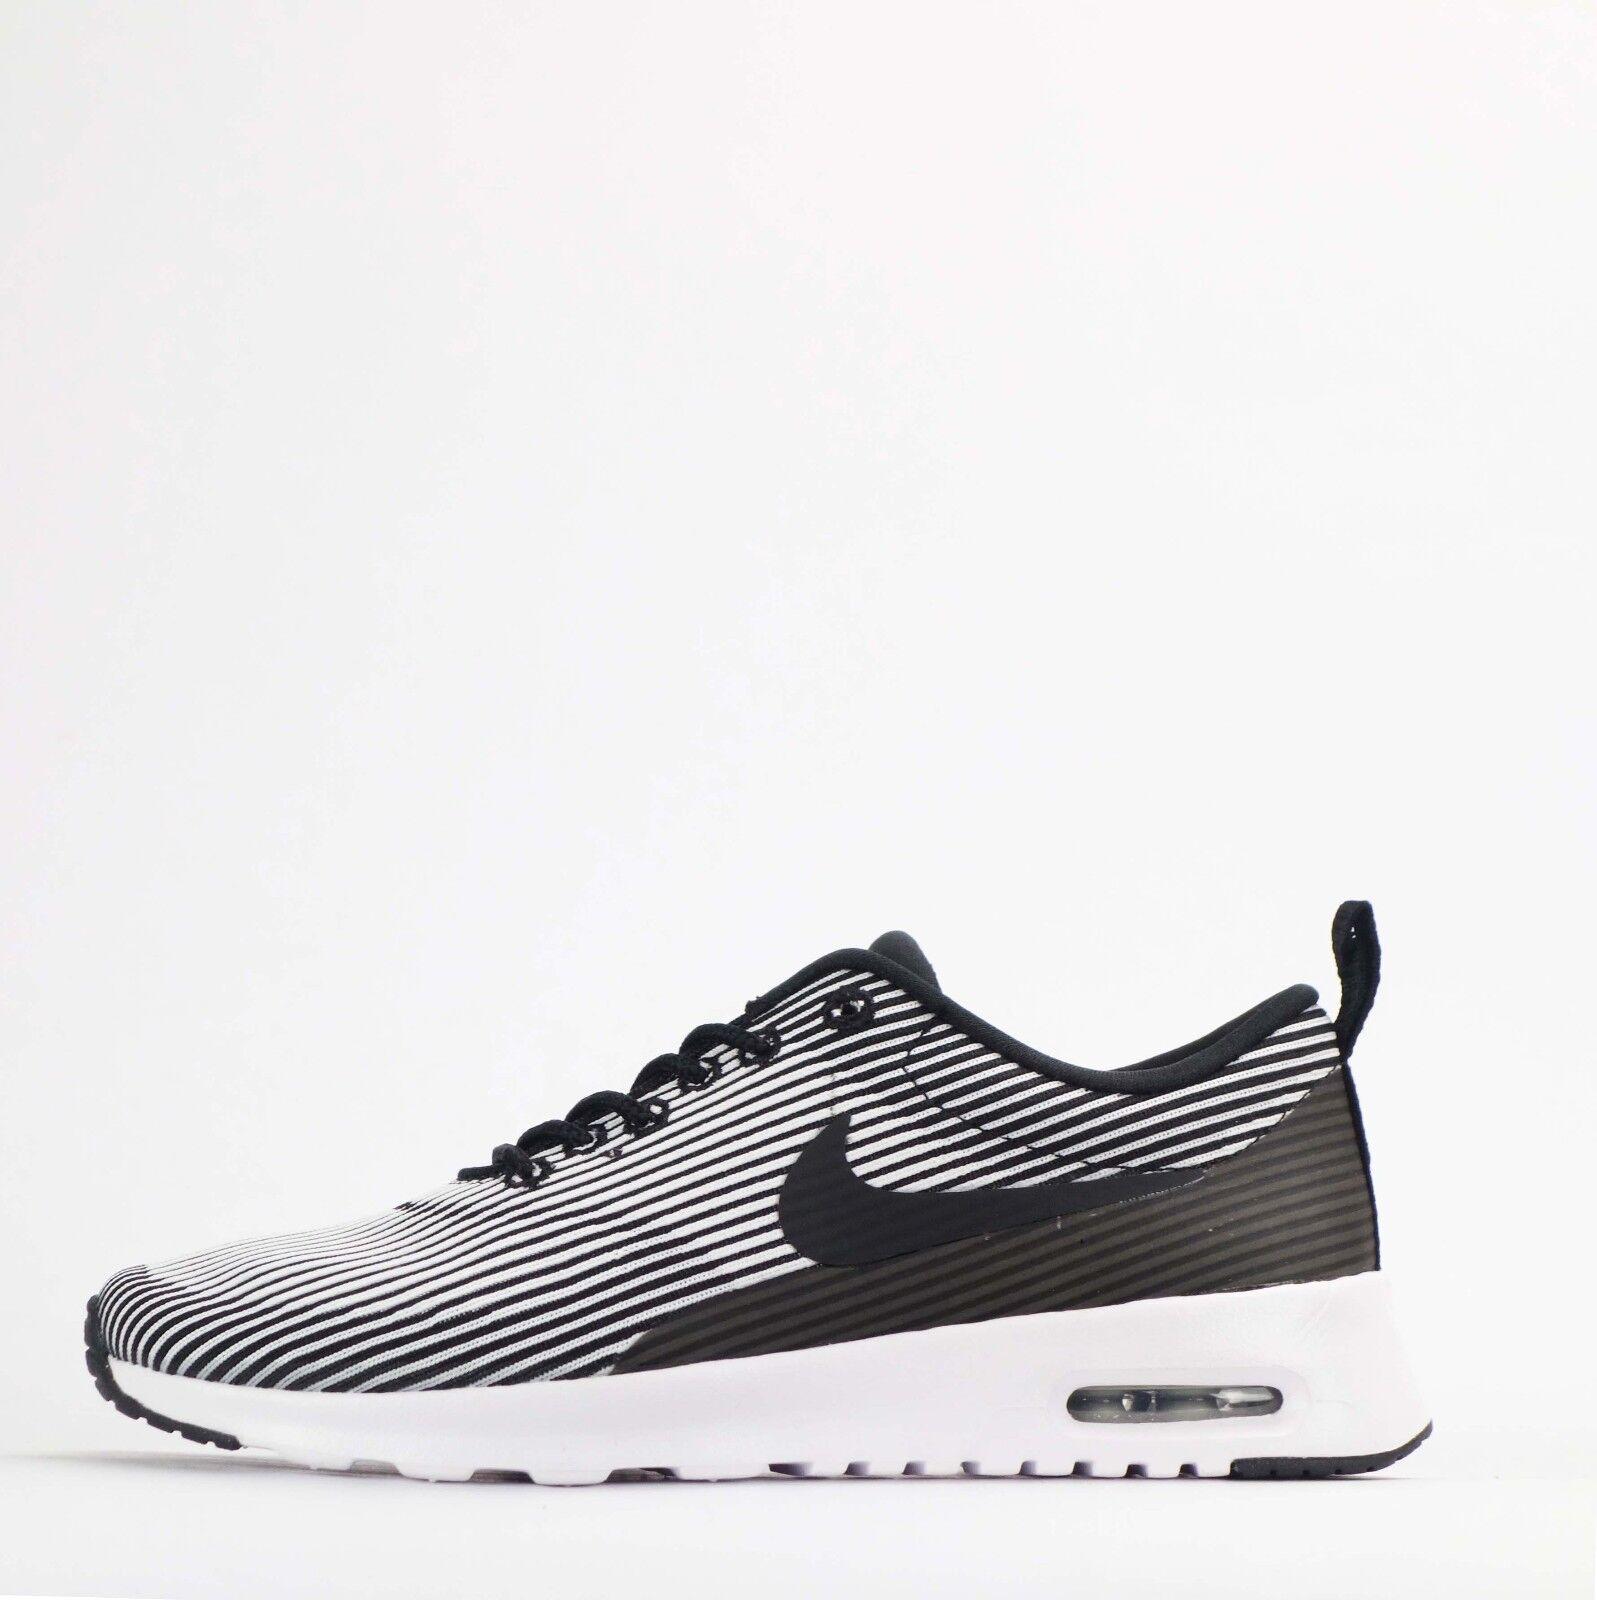 Nike Air Max Thea Jacquard Womens Trainers shoes Black White